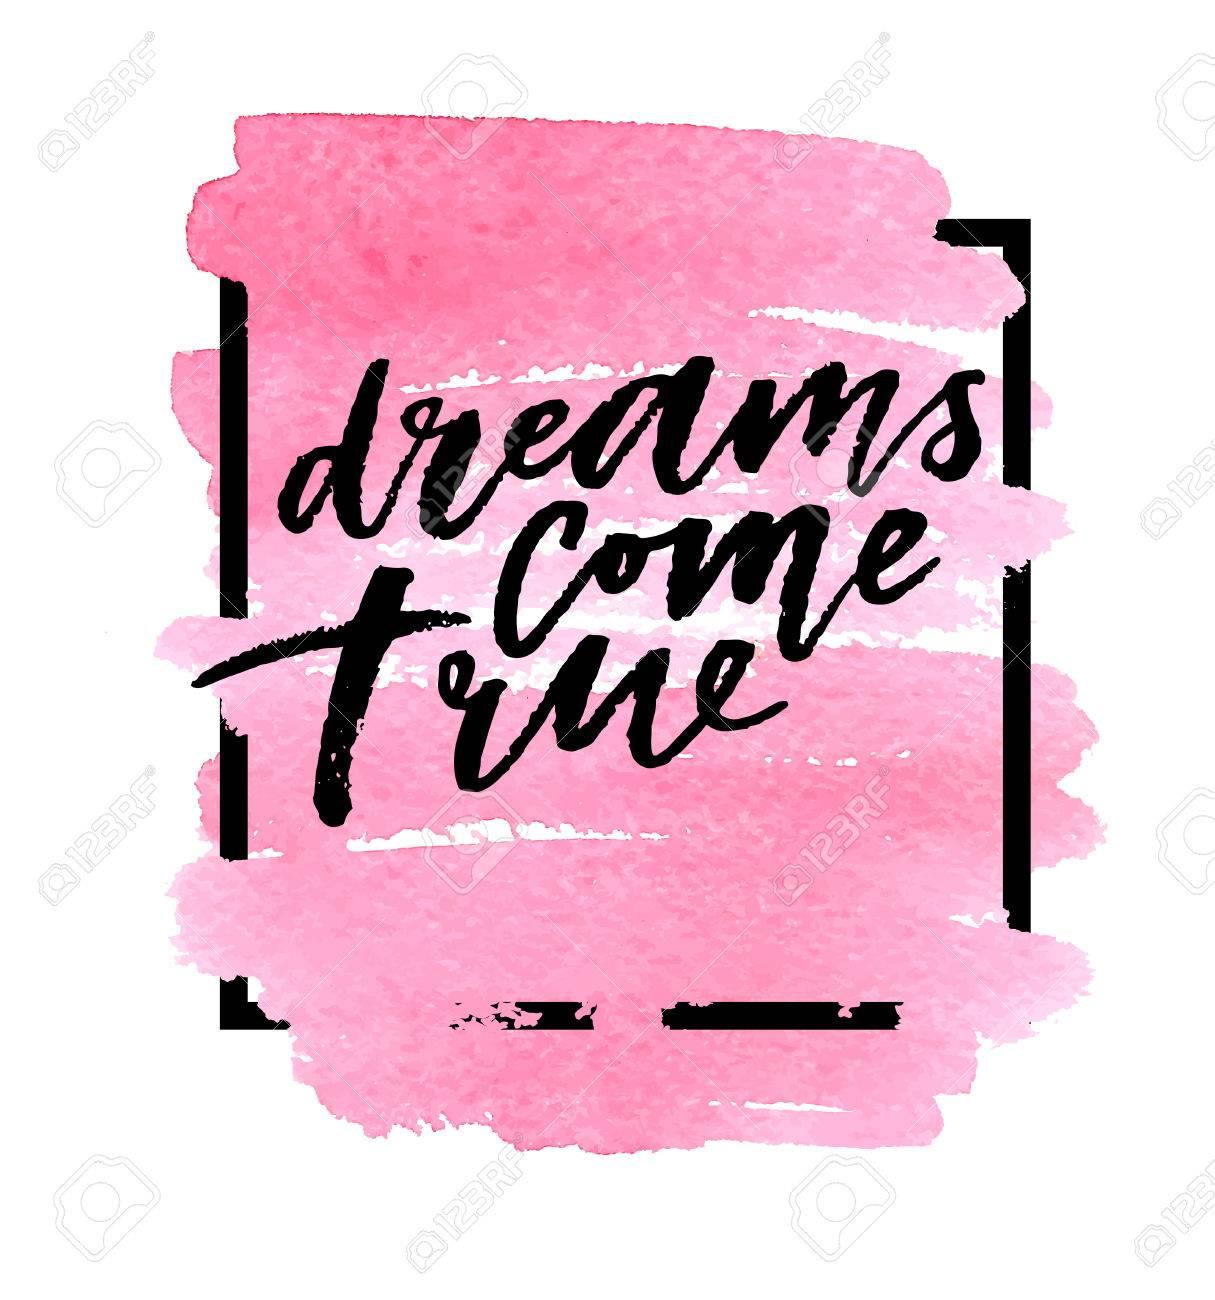 Dreams come true on watercolor pink background vector illustration dreams come true on watercolor pink background vector illustration hand lettering stock vector altavistaventures Choice Image